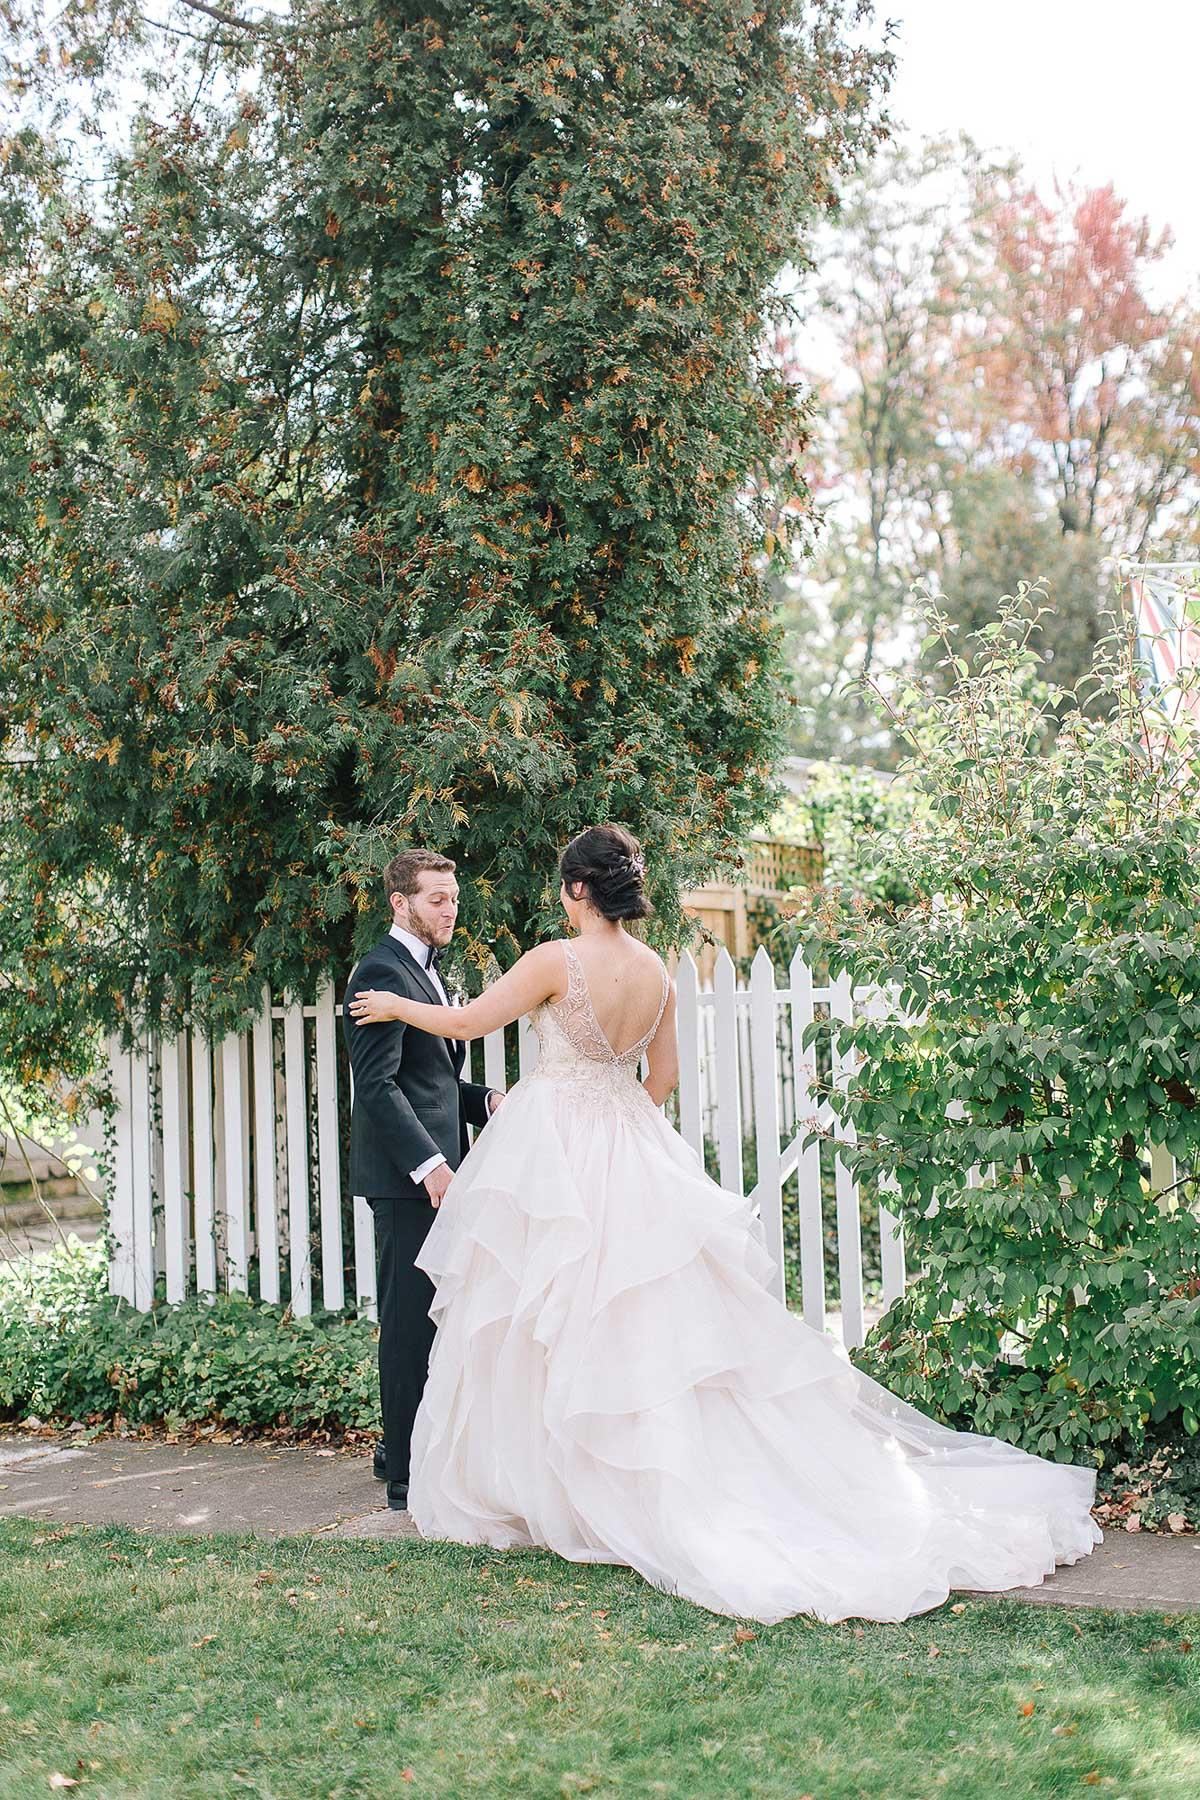 tamara-lockwood-photography-vineyard-bride-swish-list-the-old-courthouse-niagara-on-the-lake-wedding-18.jpg